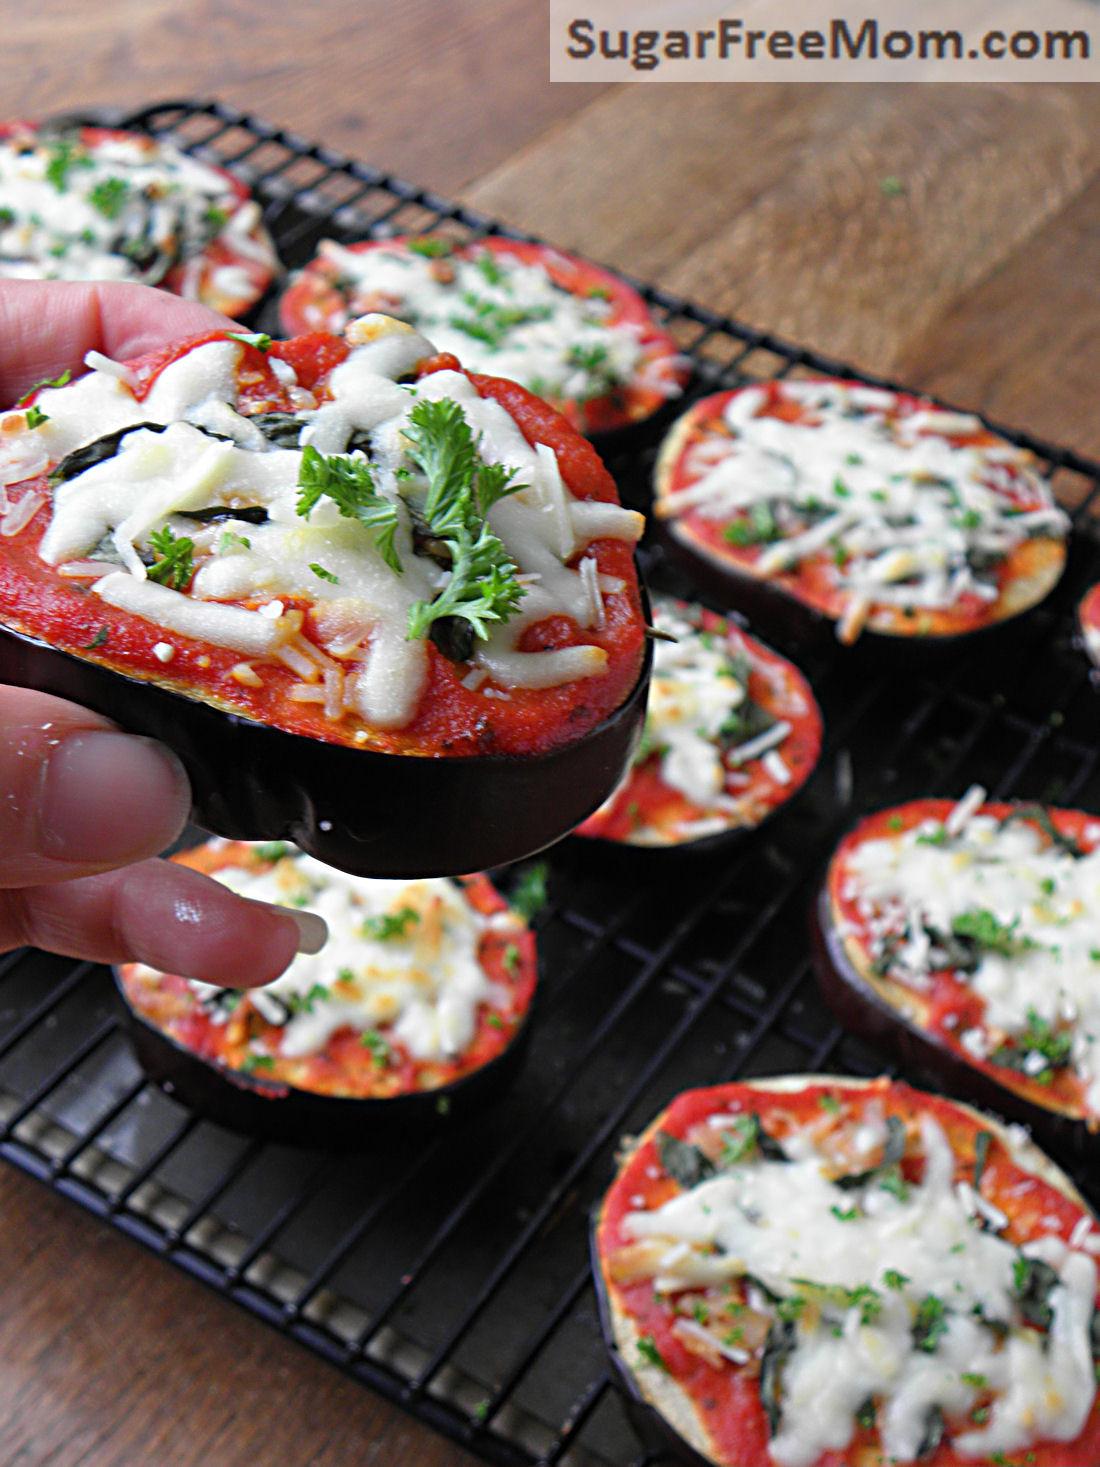 Eggplant Low Carb Recipes  Low Carb Eggplant Pizzas